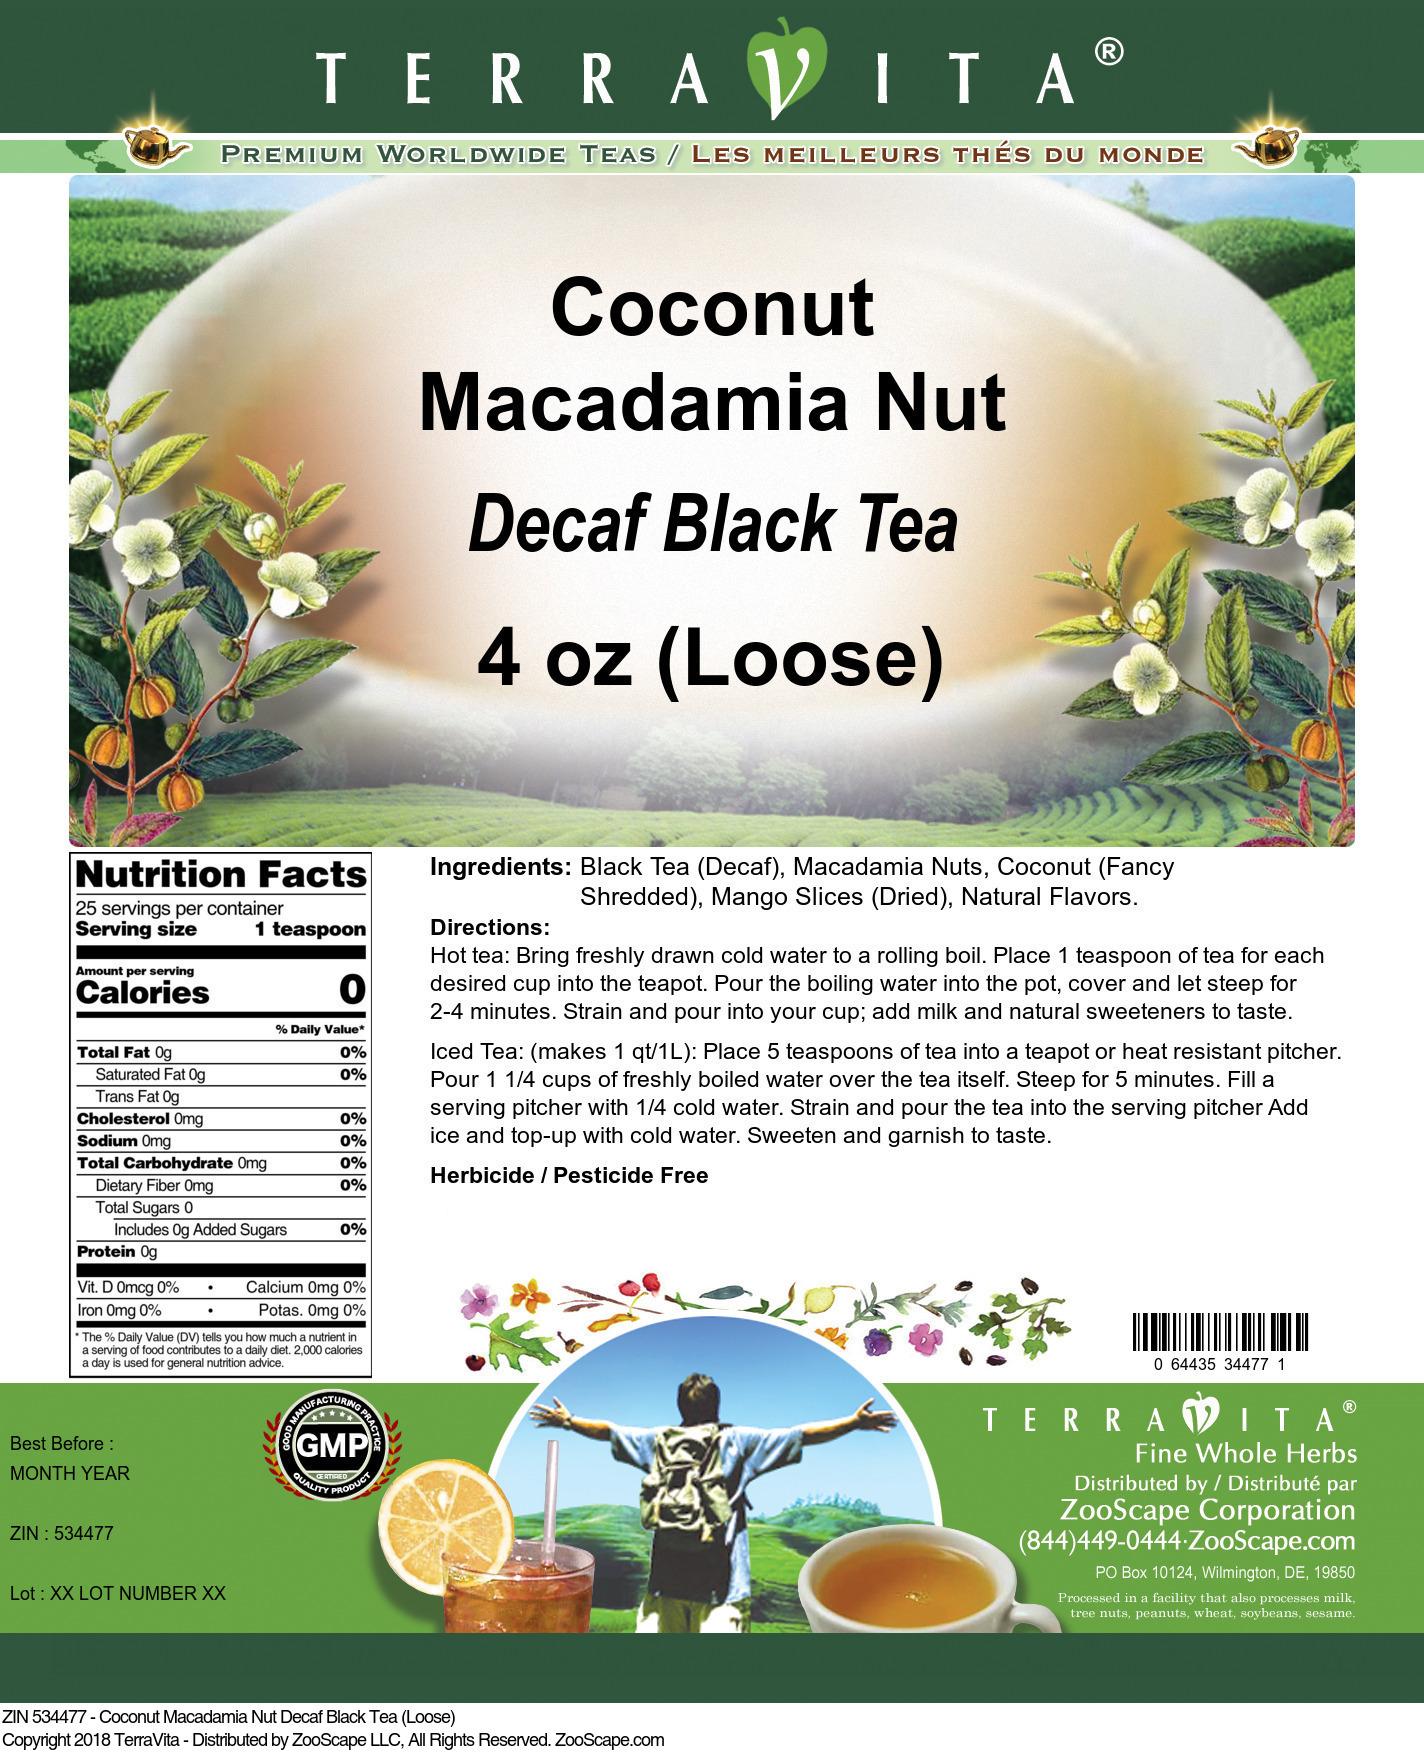 Coconut Macadamia Nut Decaf Black Tea (Loose)